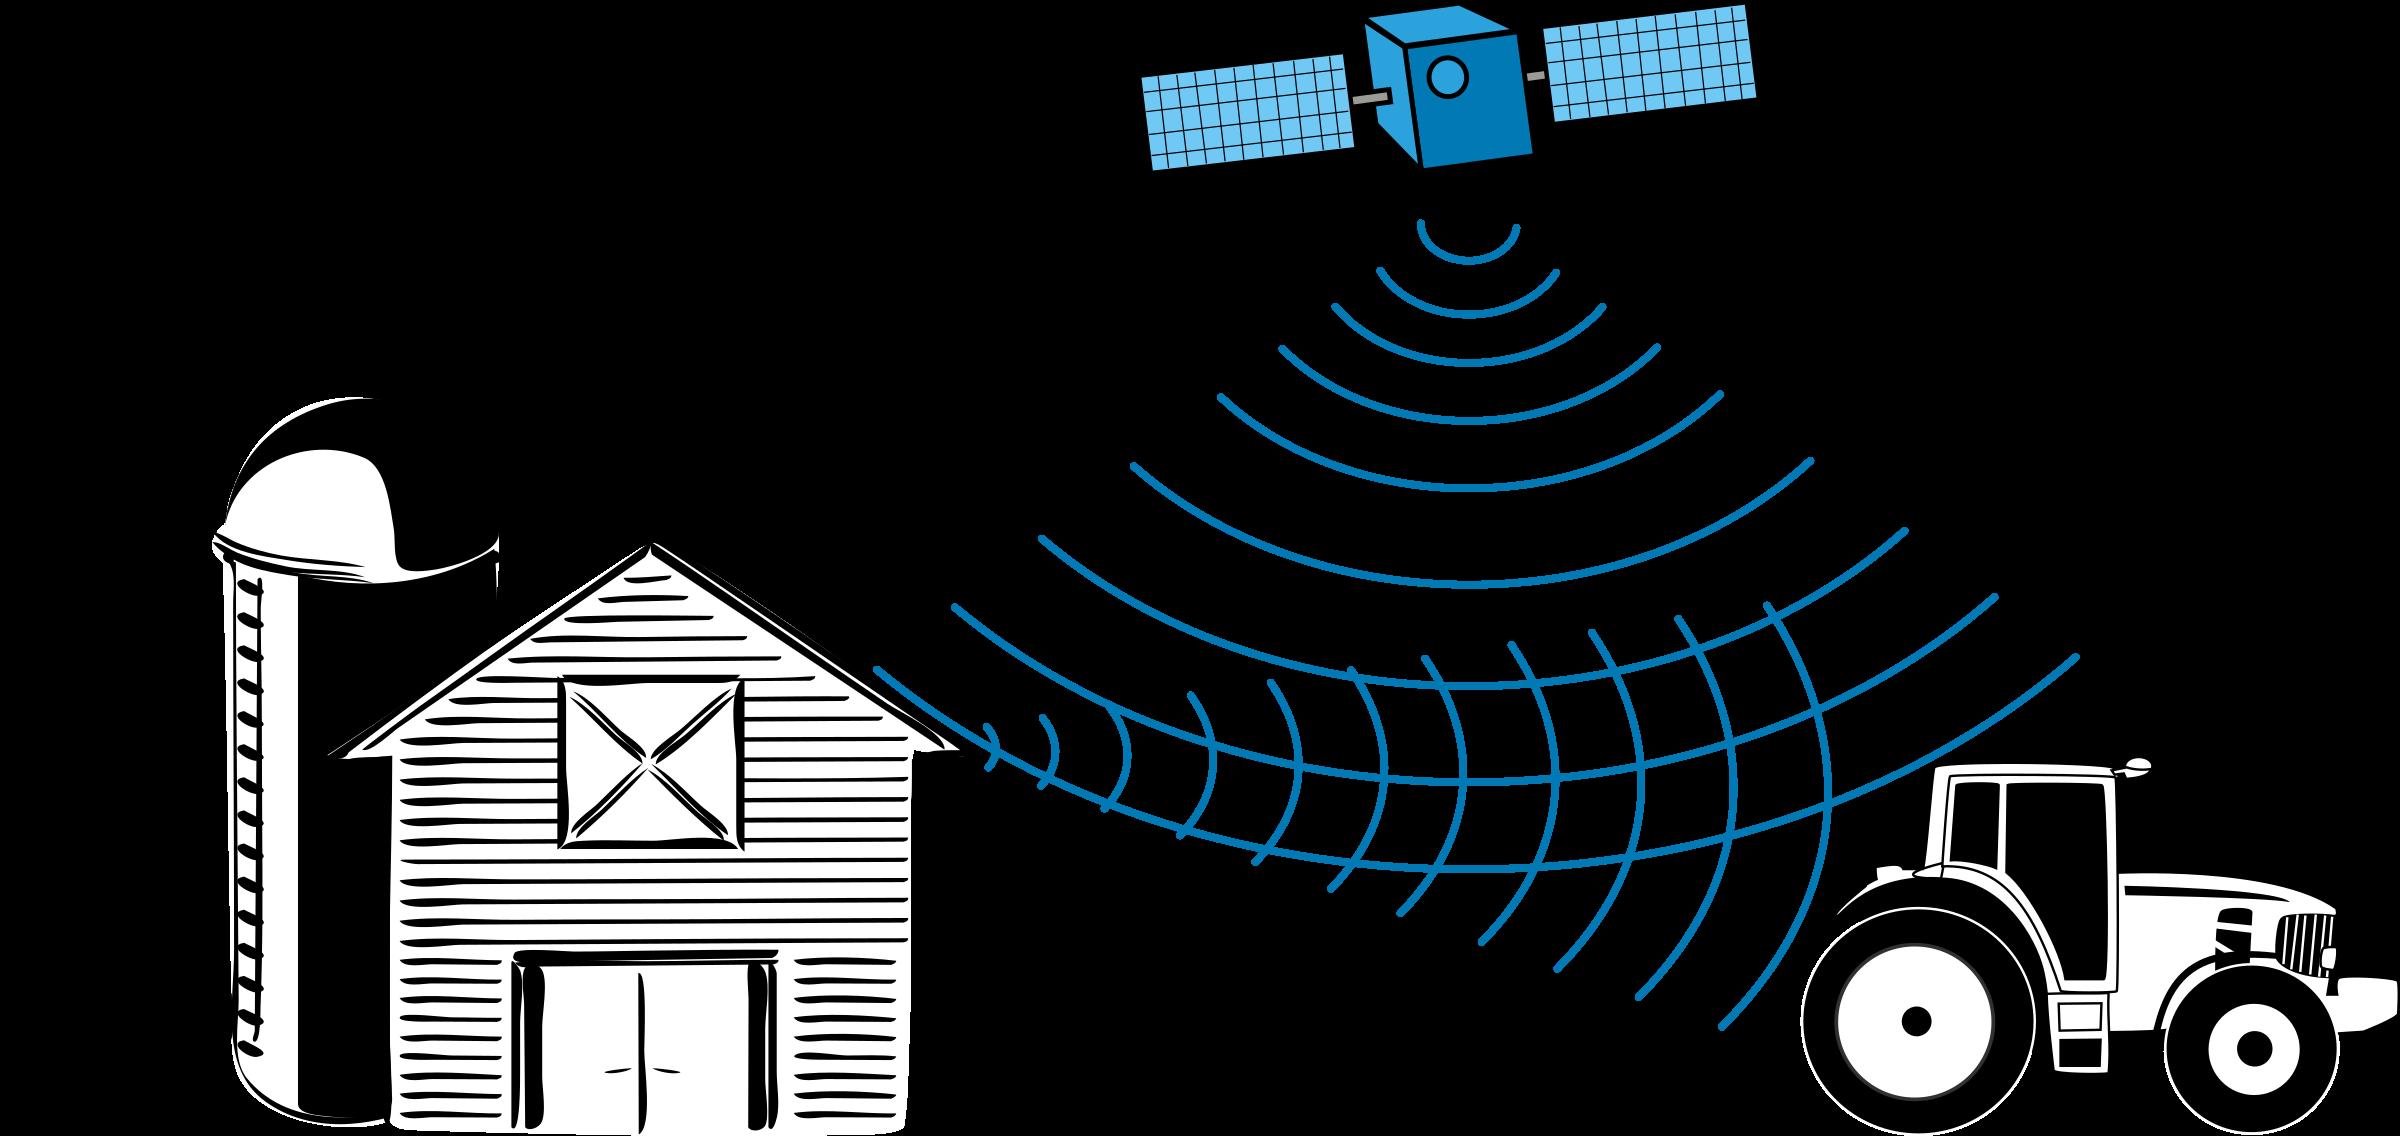 Gps clipart satellite signal. Multipath effect big image